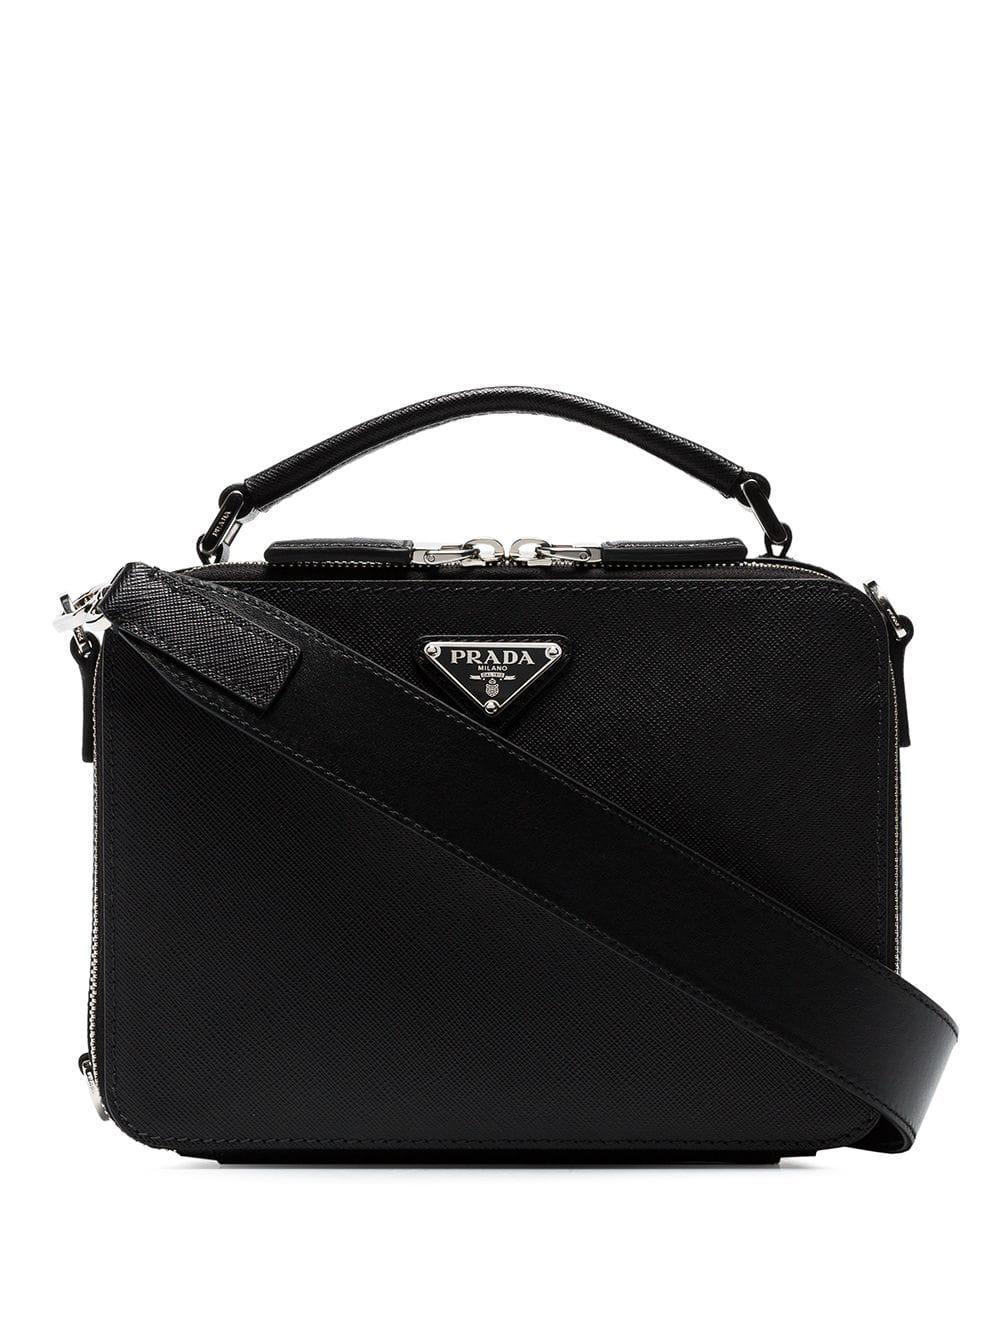 cd1aee470305 Prada Black Brique Saffiano Leather Bag